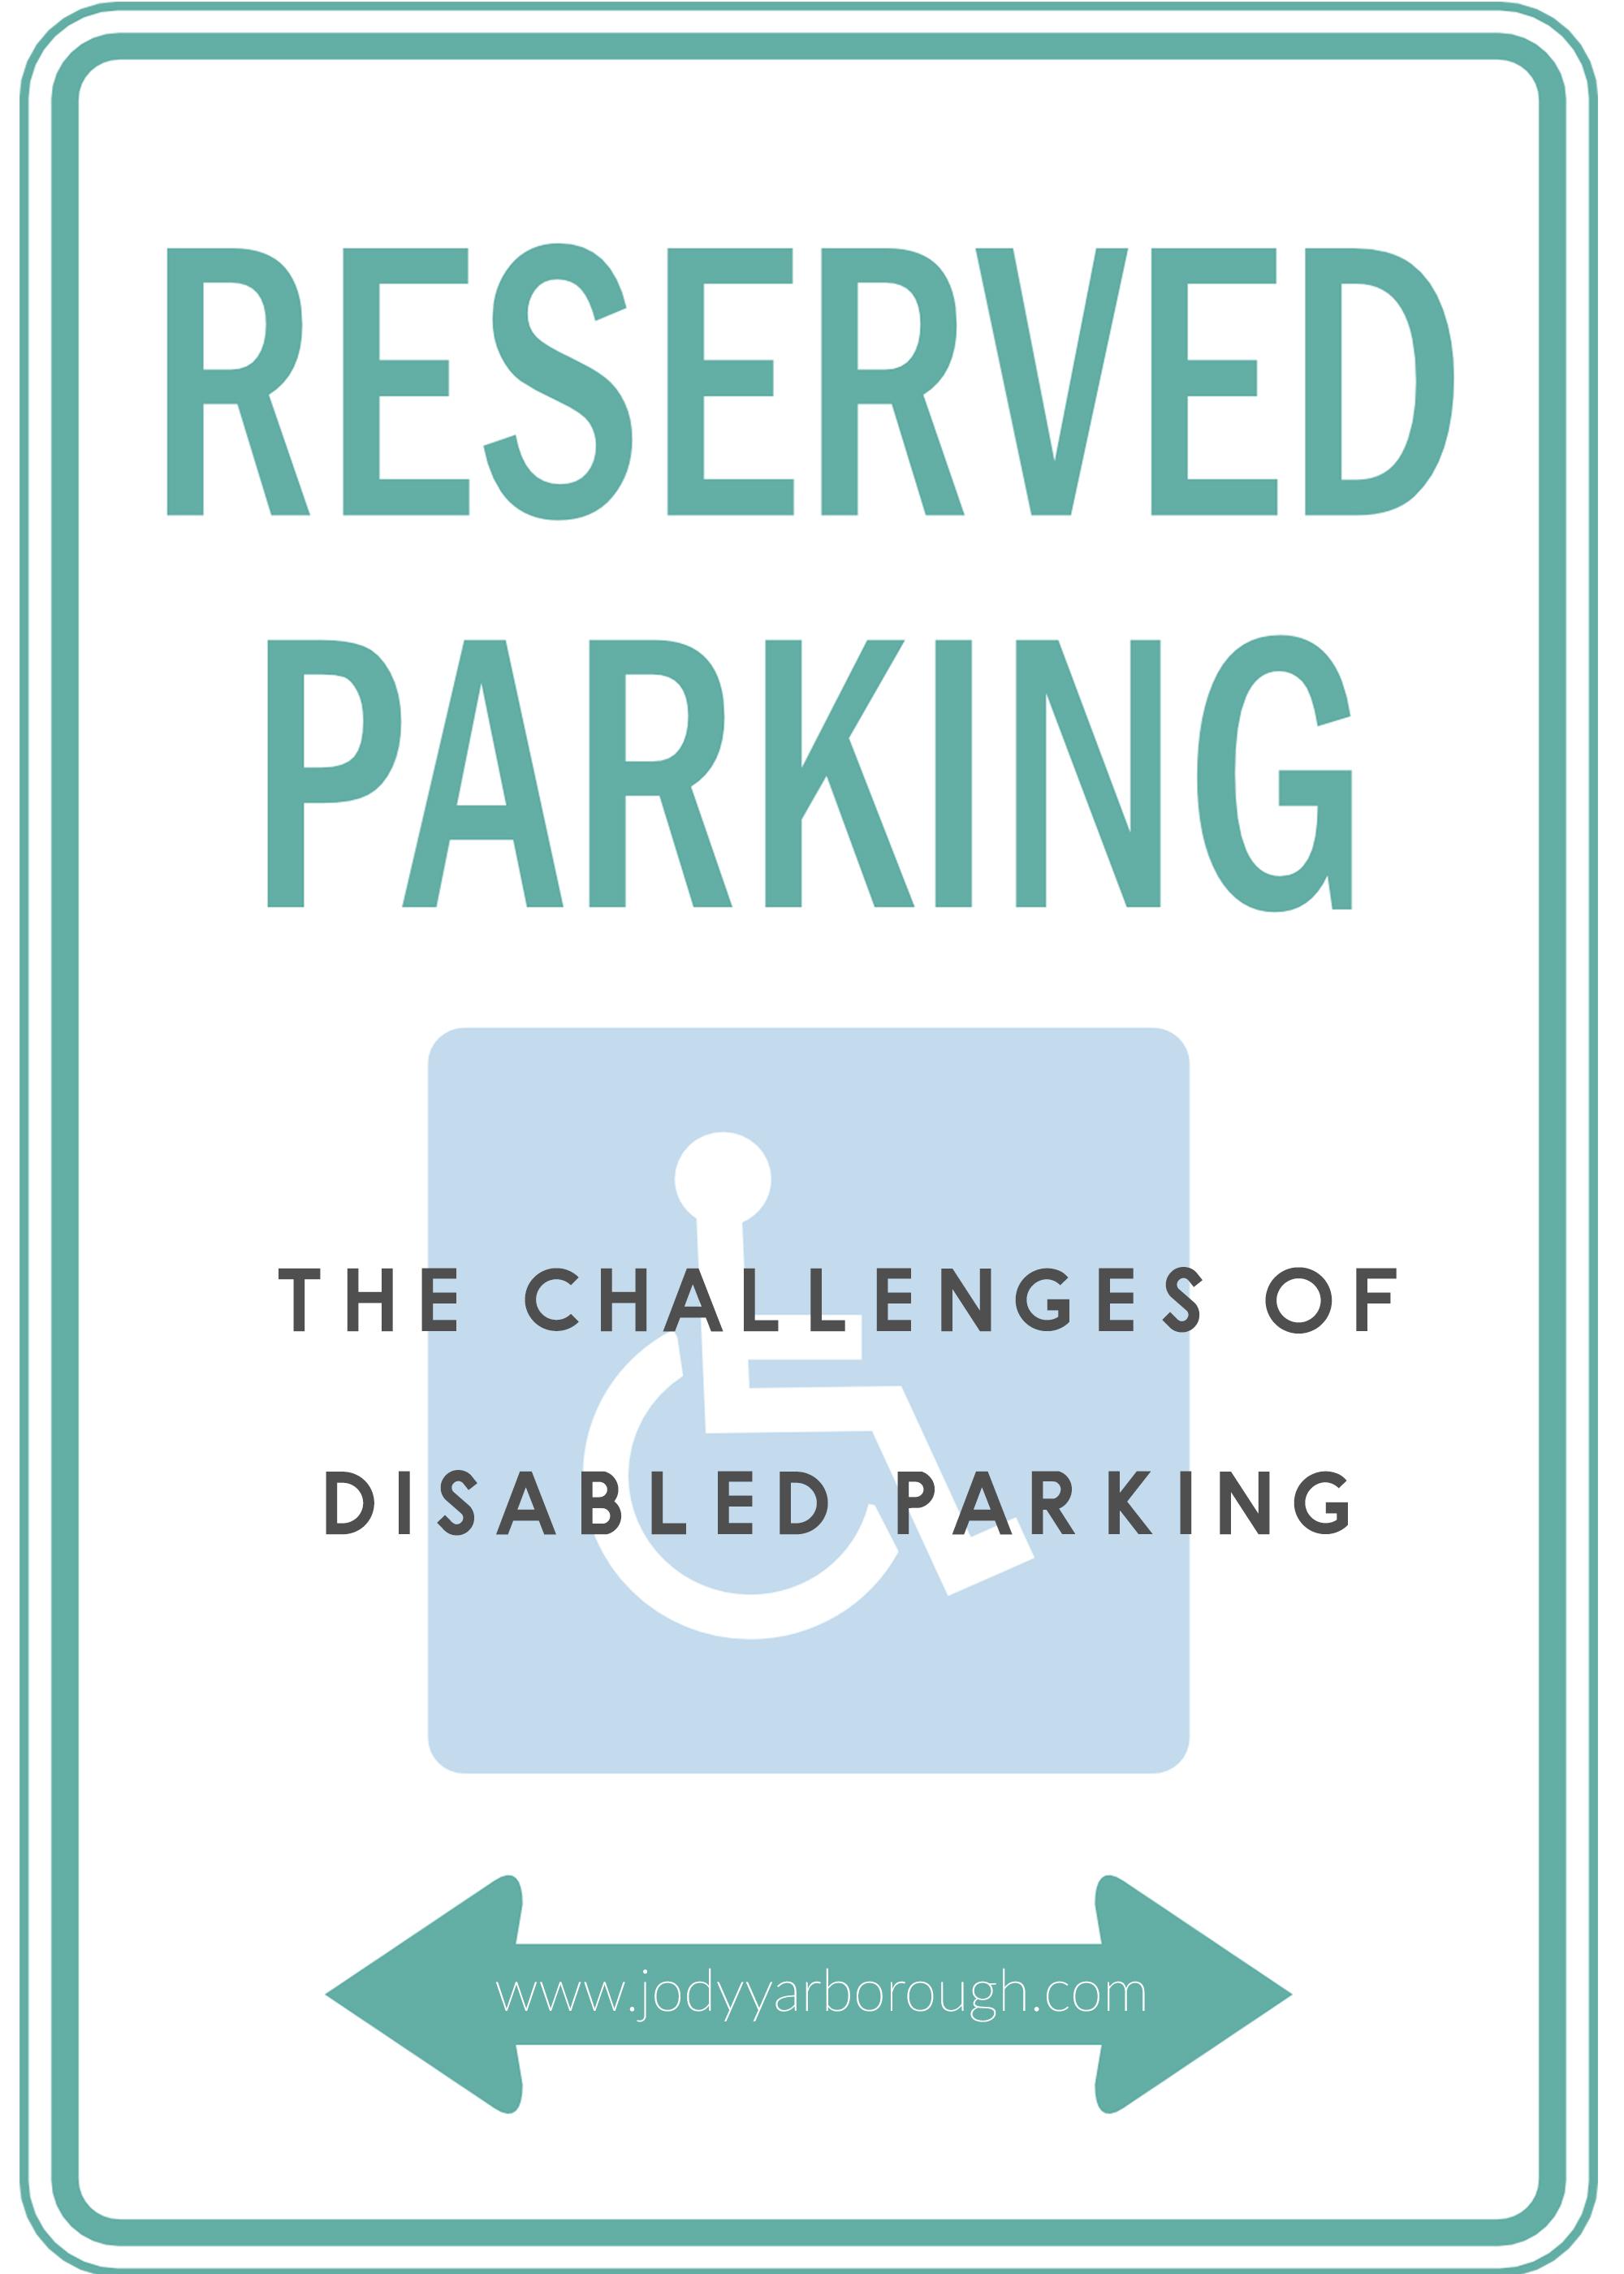 disabled parking.jpg